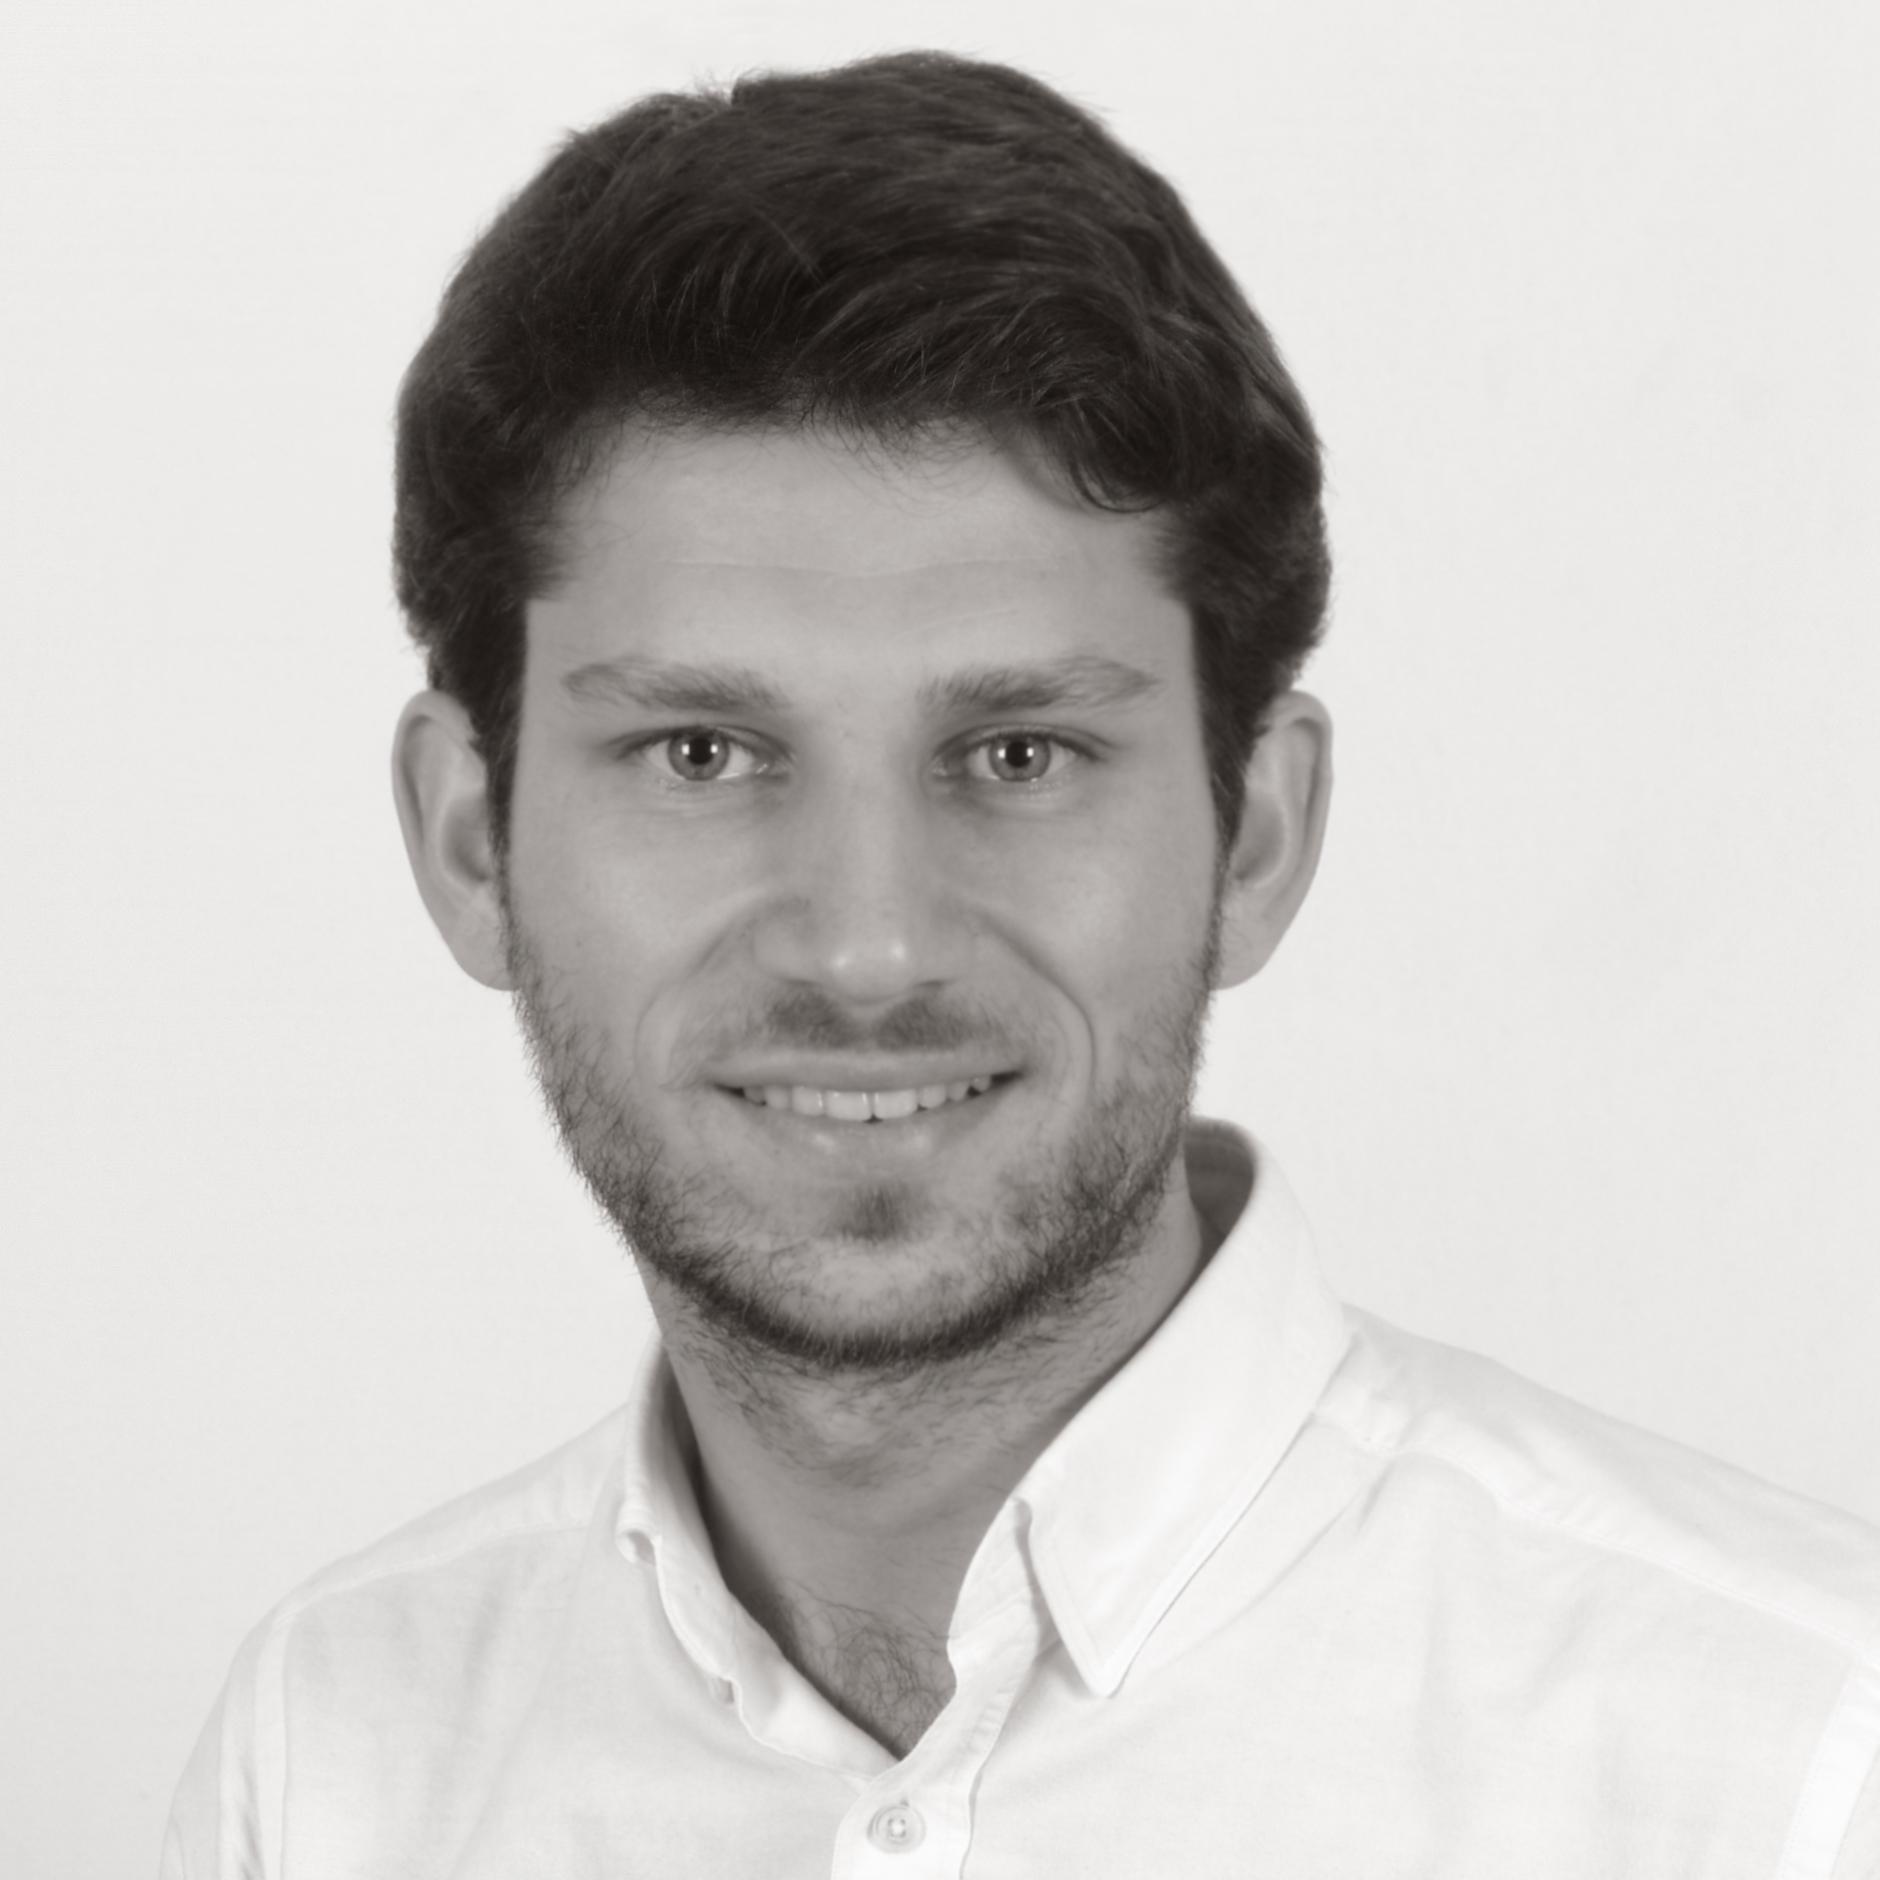 Murat Sokun